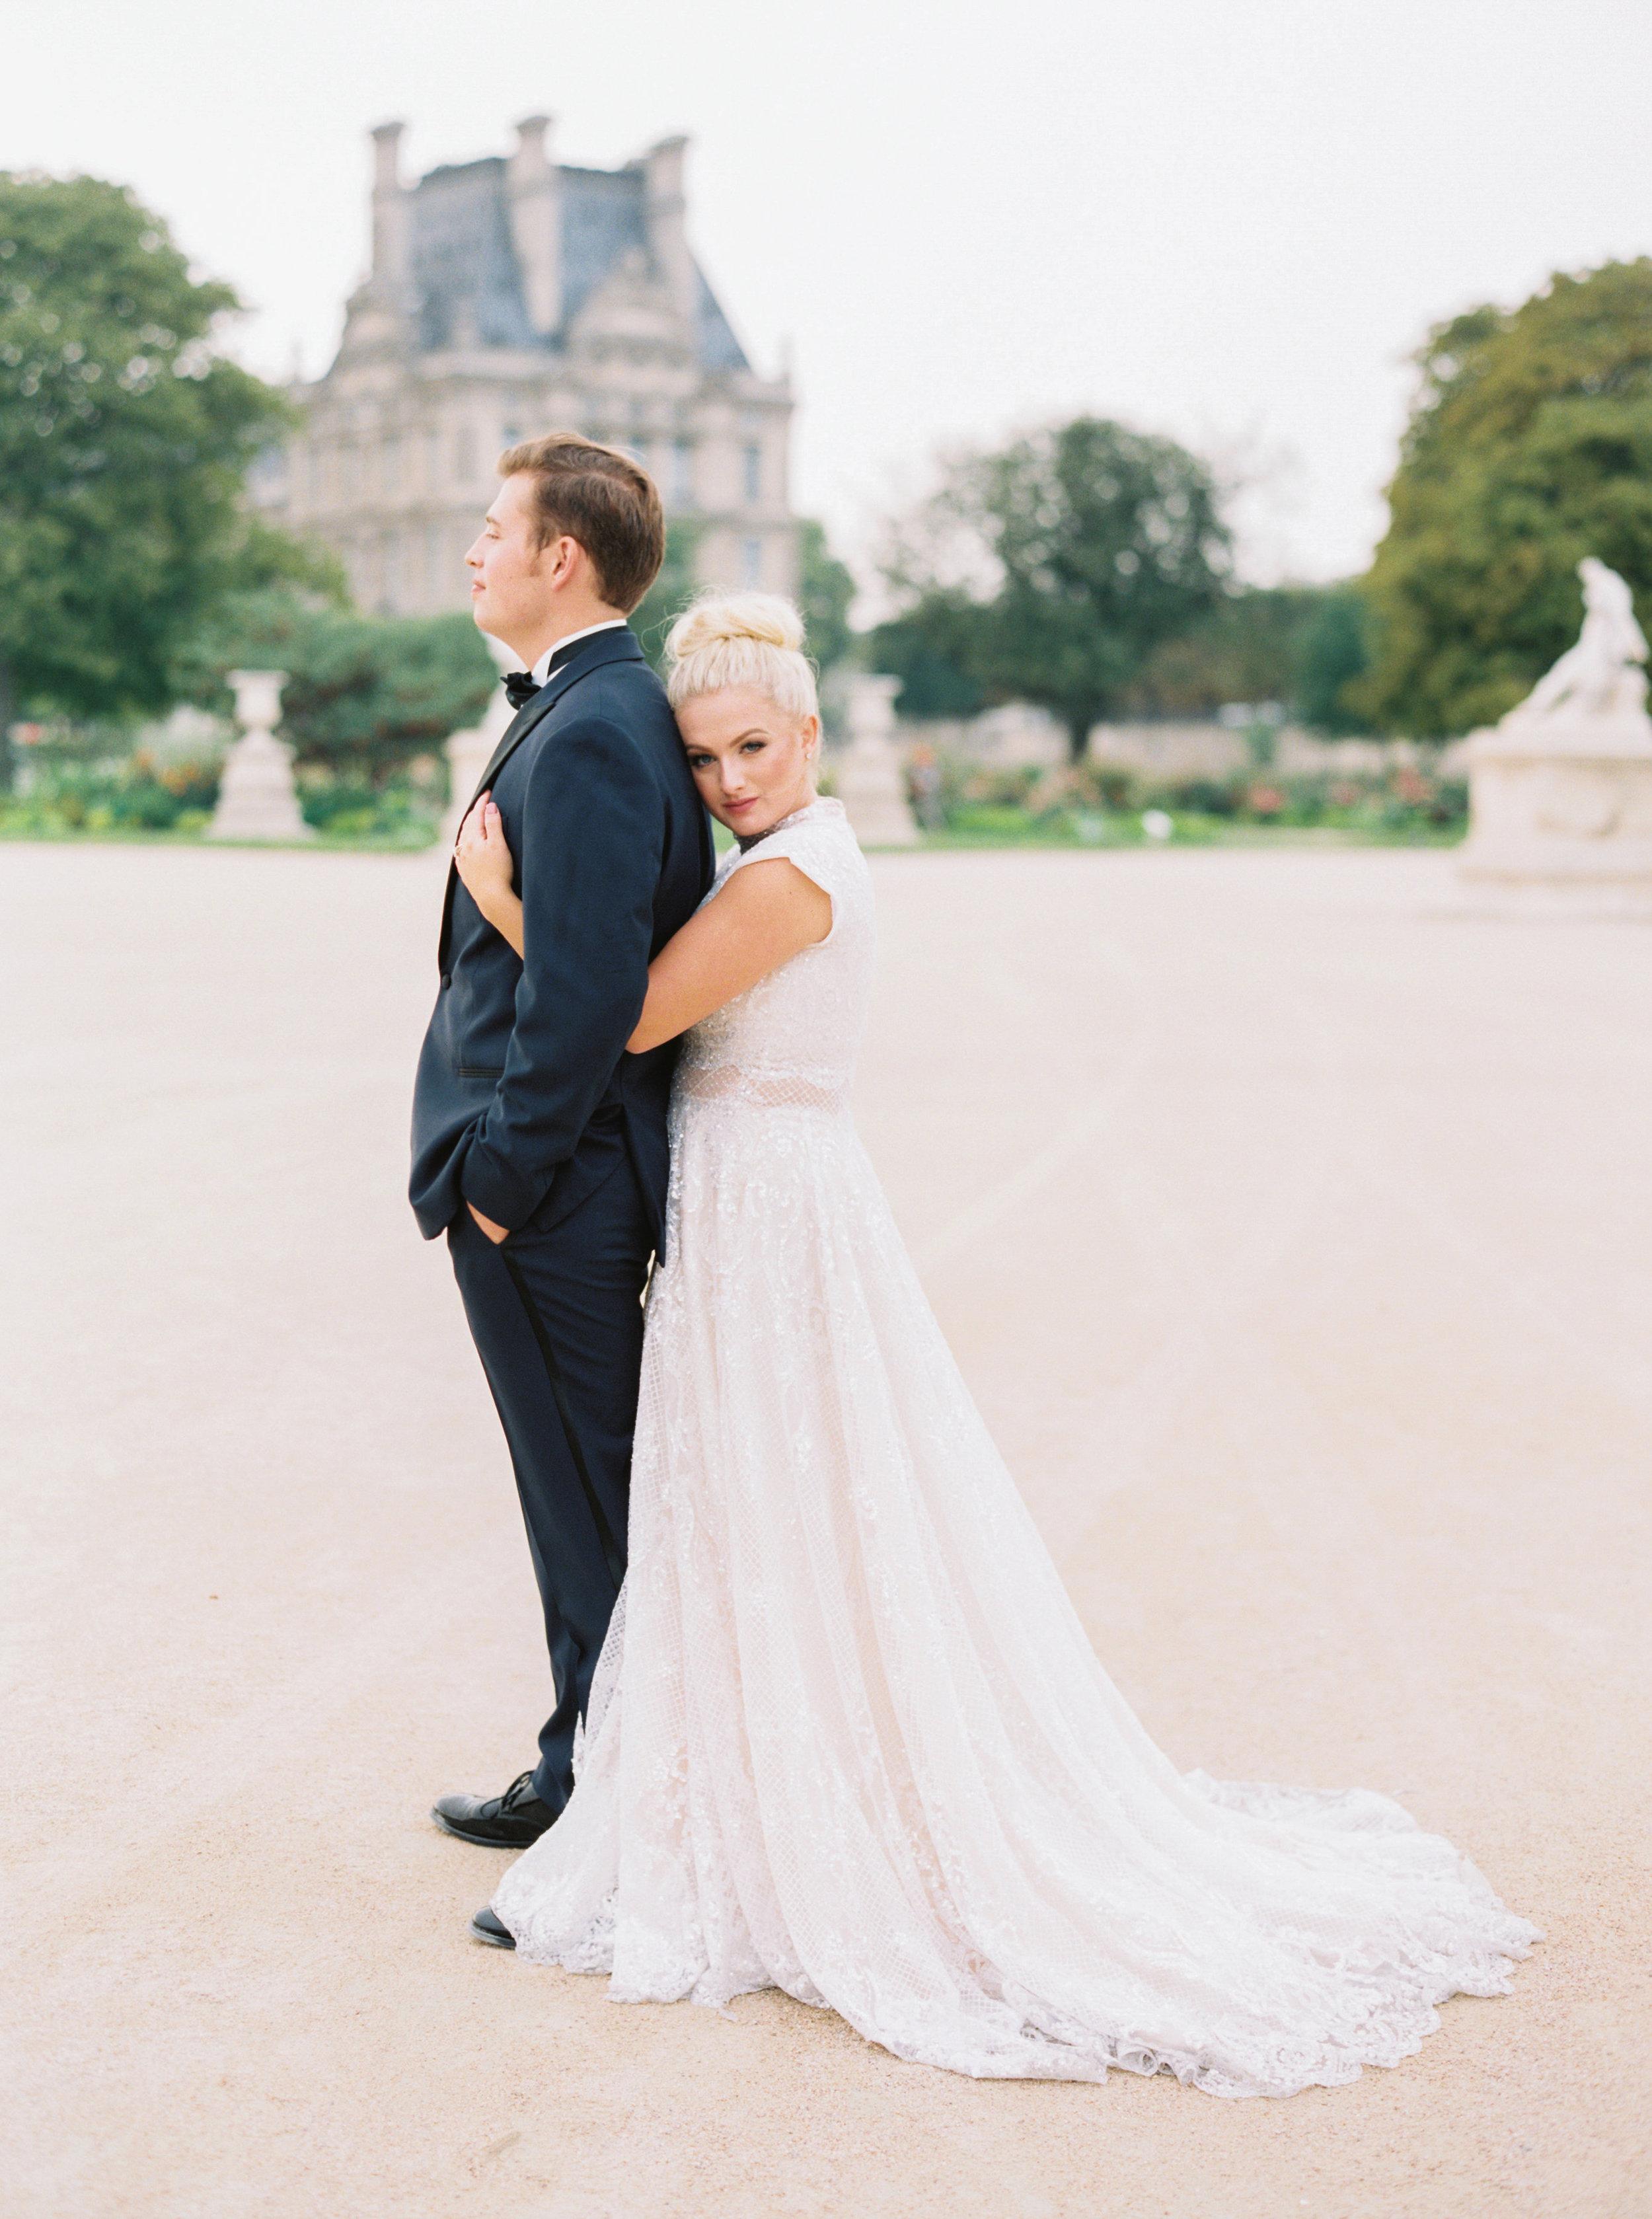 Rachael and Cameron - Paris, France (real bride)